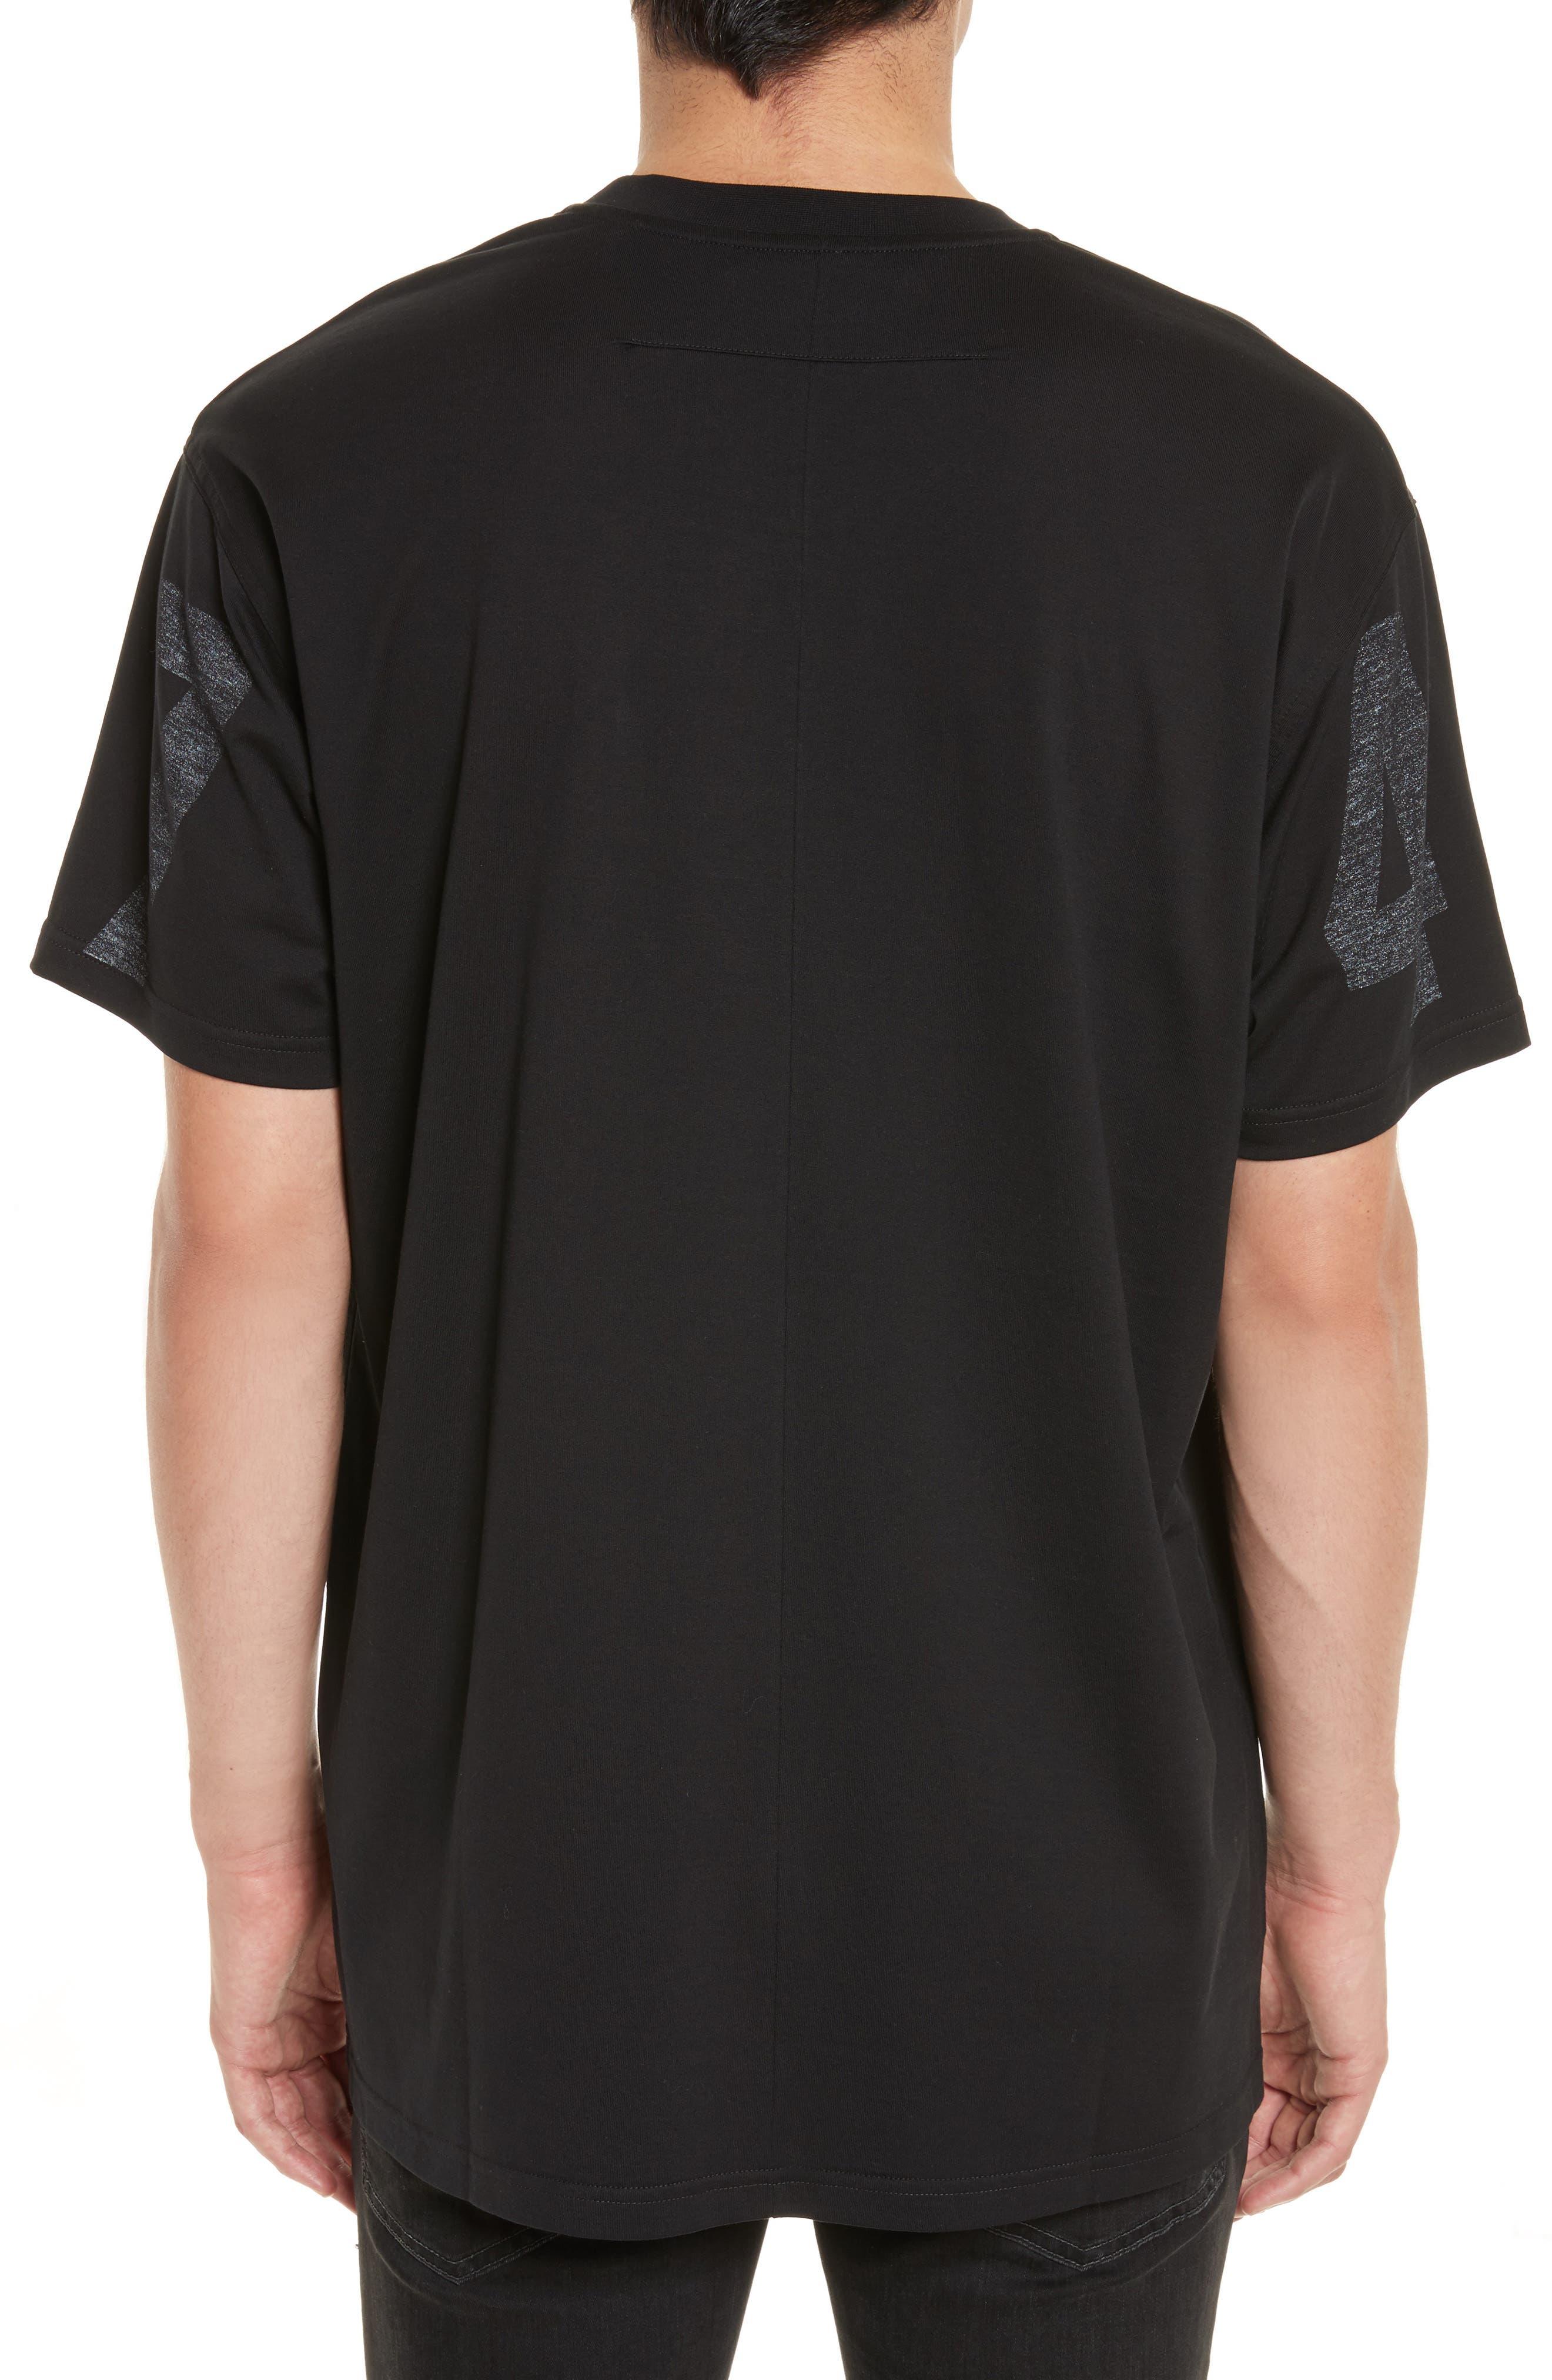 Alternate Image 2  - Givenchy Columbian Fit Aloha Graphic T-Shirt